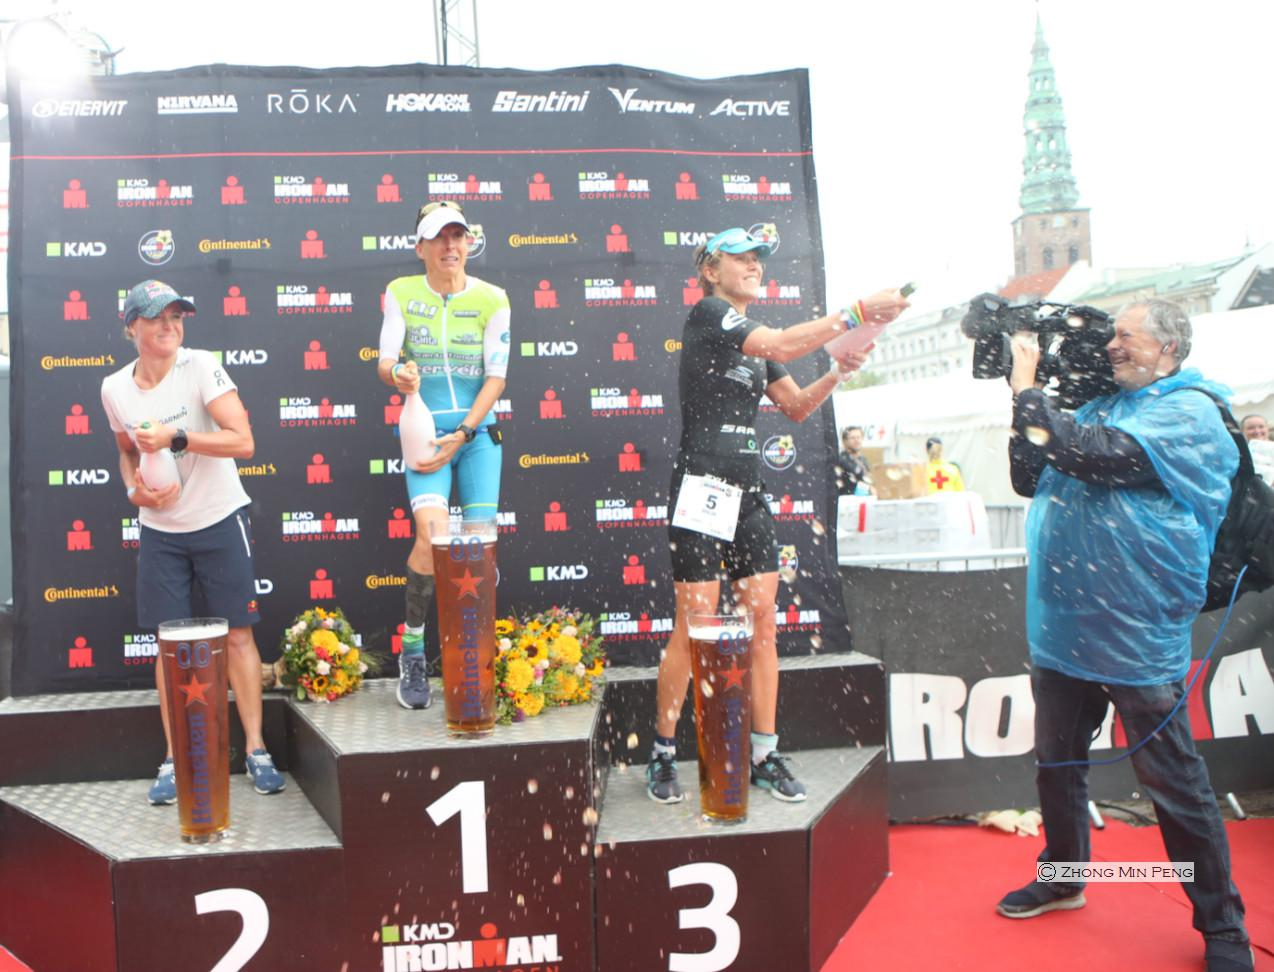 Venstre Anne Haug, midten Camilla Pedersen, hoejre Maja Stage Nielsen